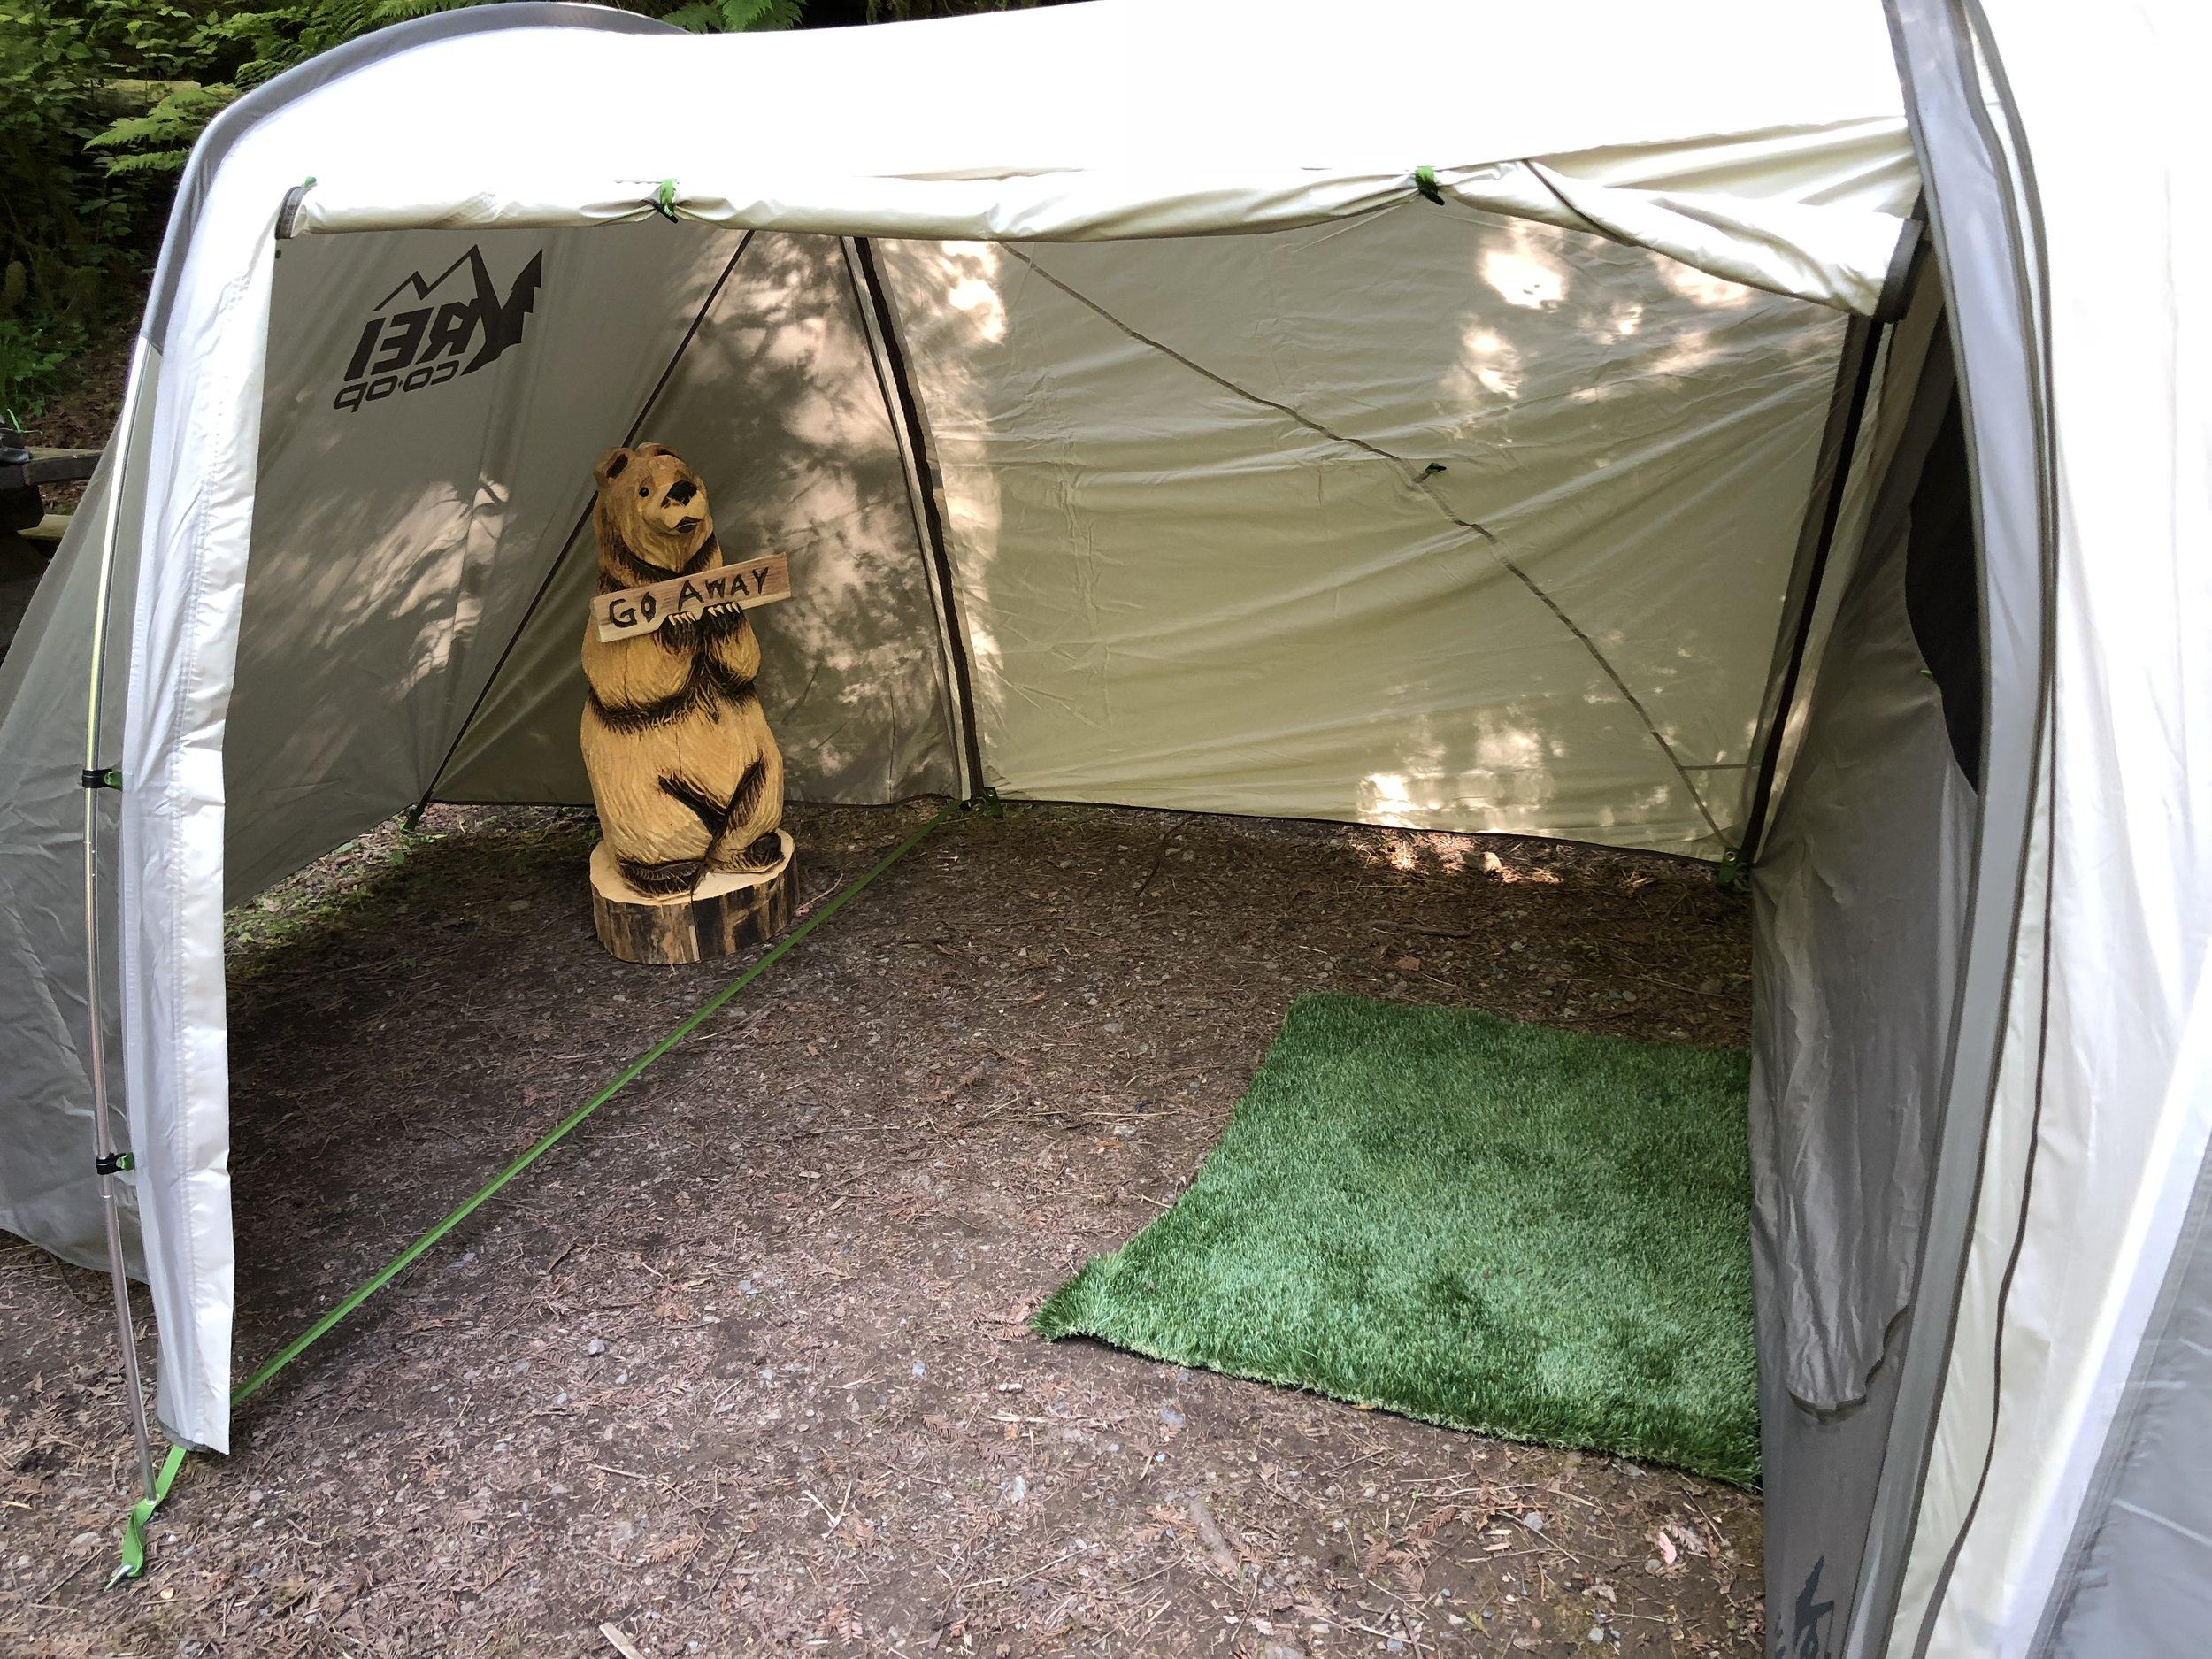 REI Garage attached to Kingdom 6 tent.